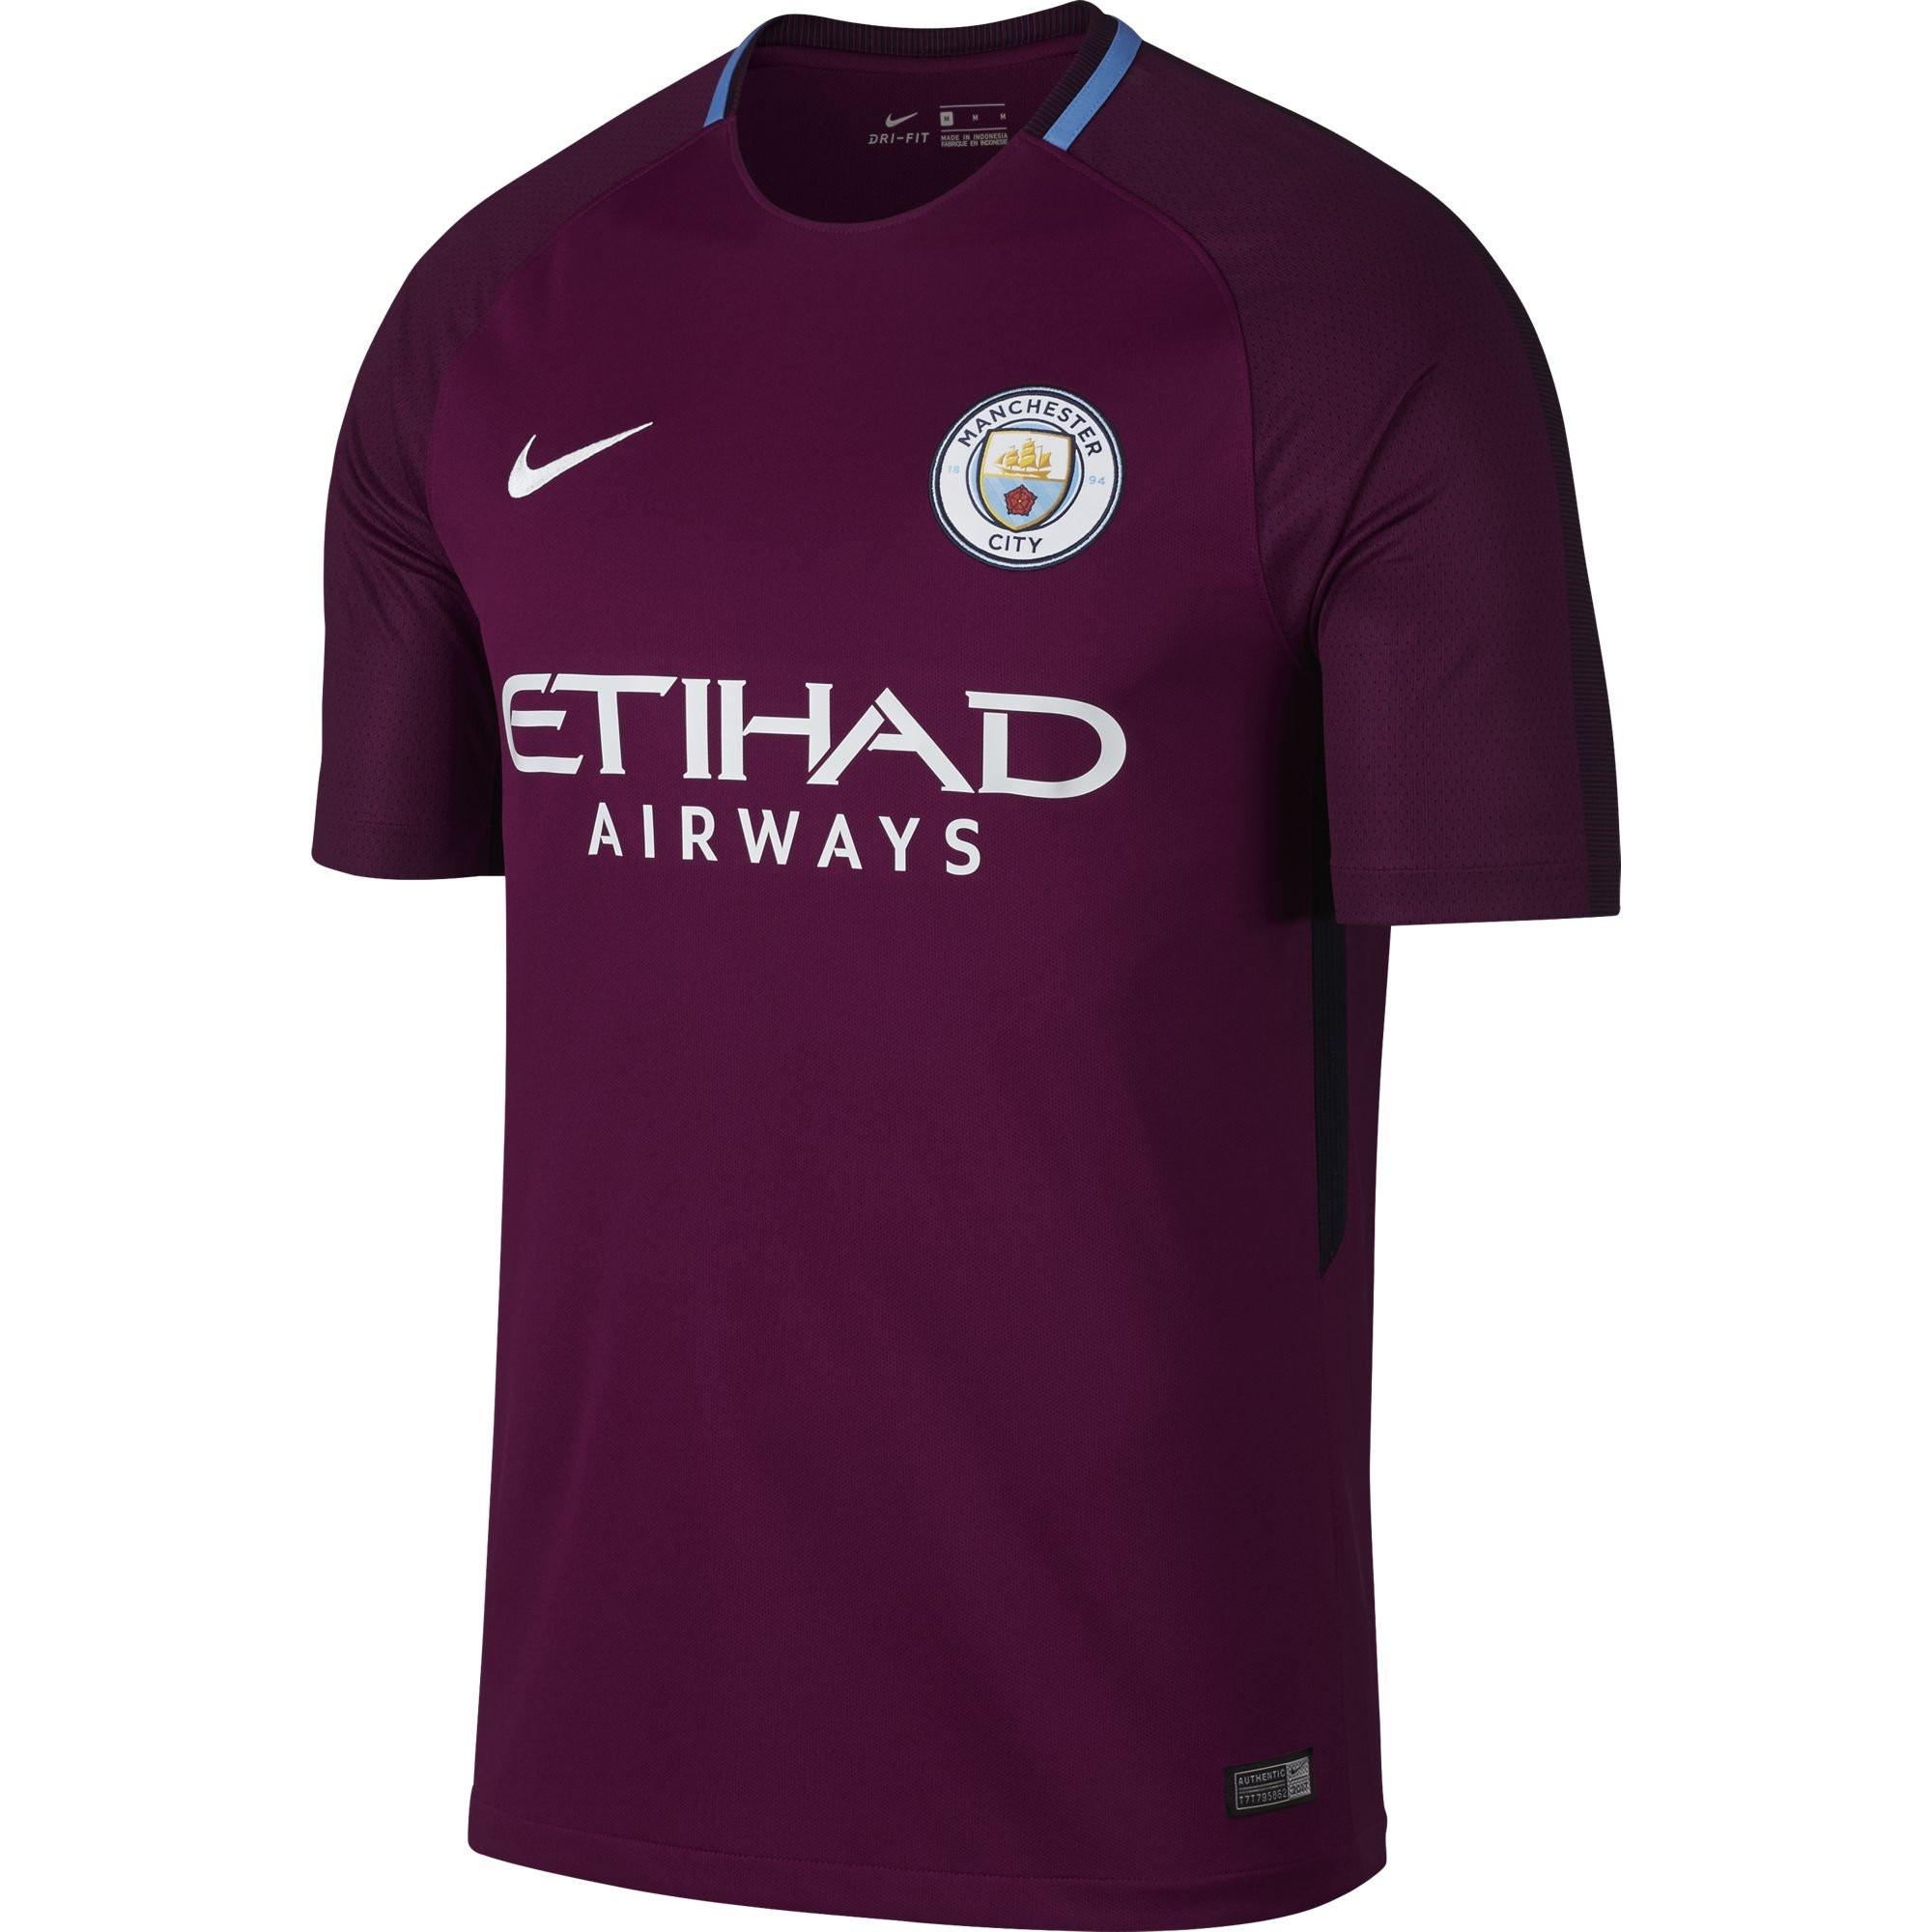 Maillot Extérieur Manchester City acheter